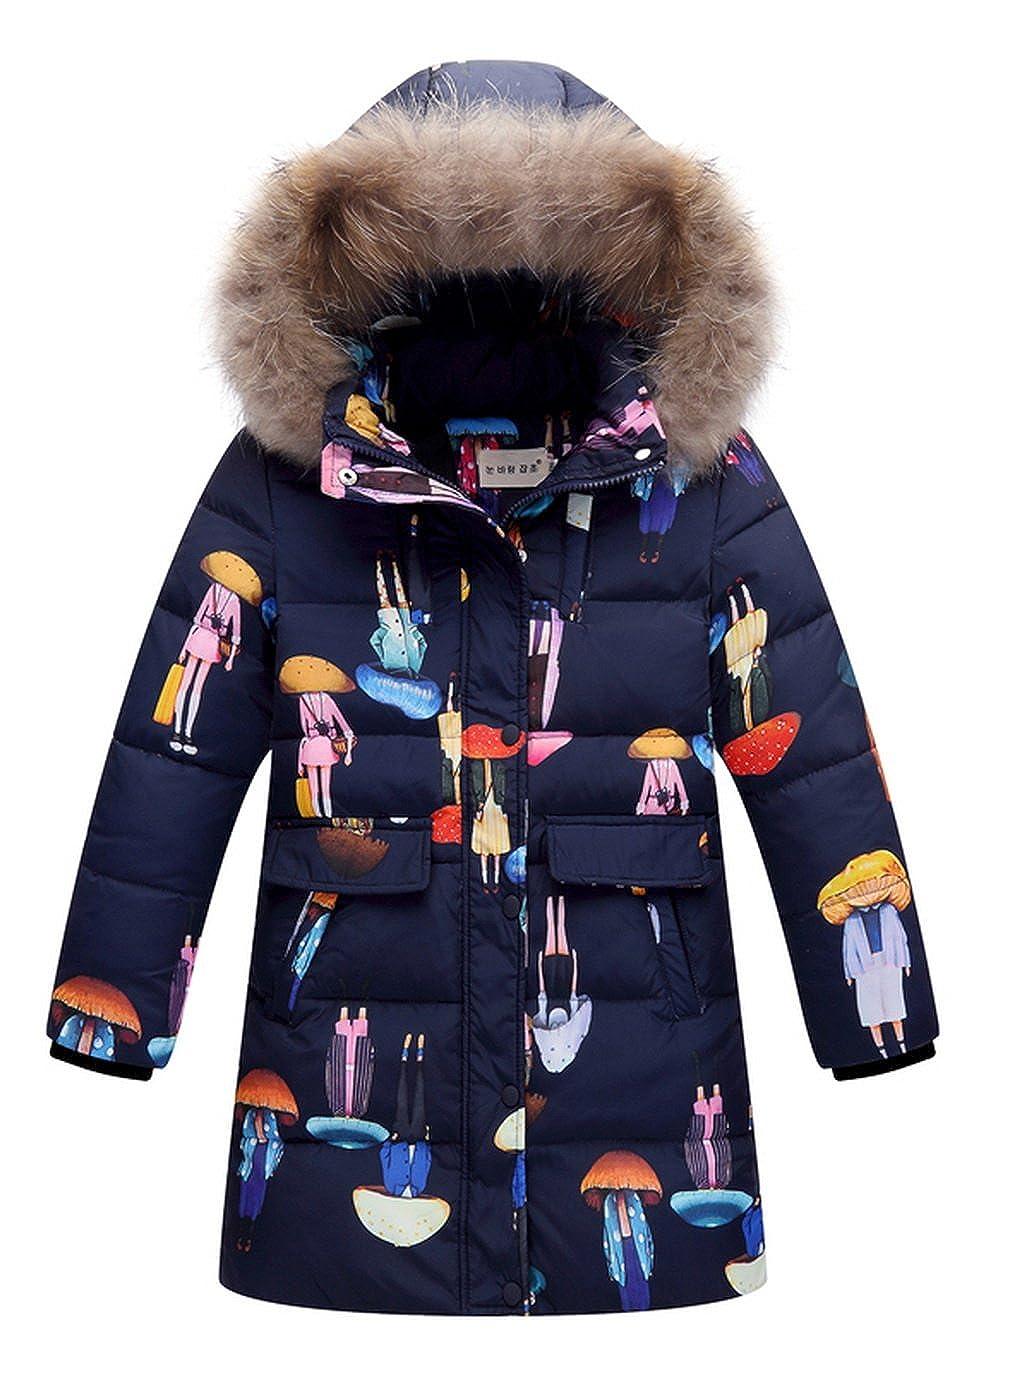 La Vogue Girls Mid-Long Winter Hooded Down Coat Puffer Jacket Overcoat